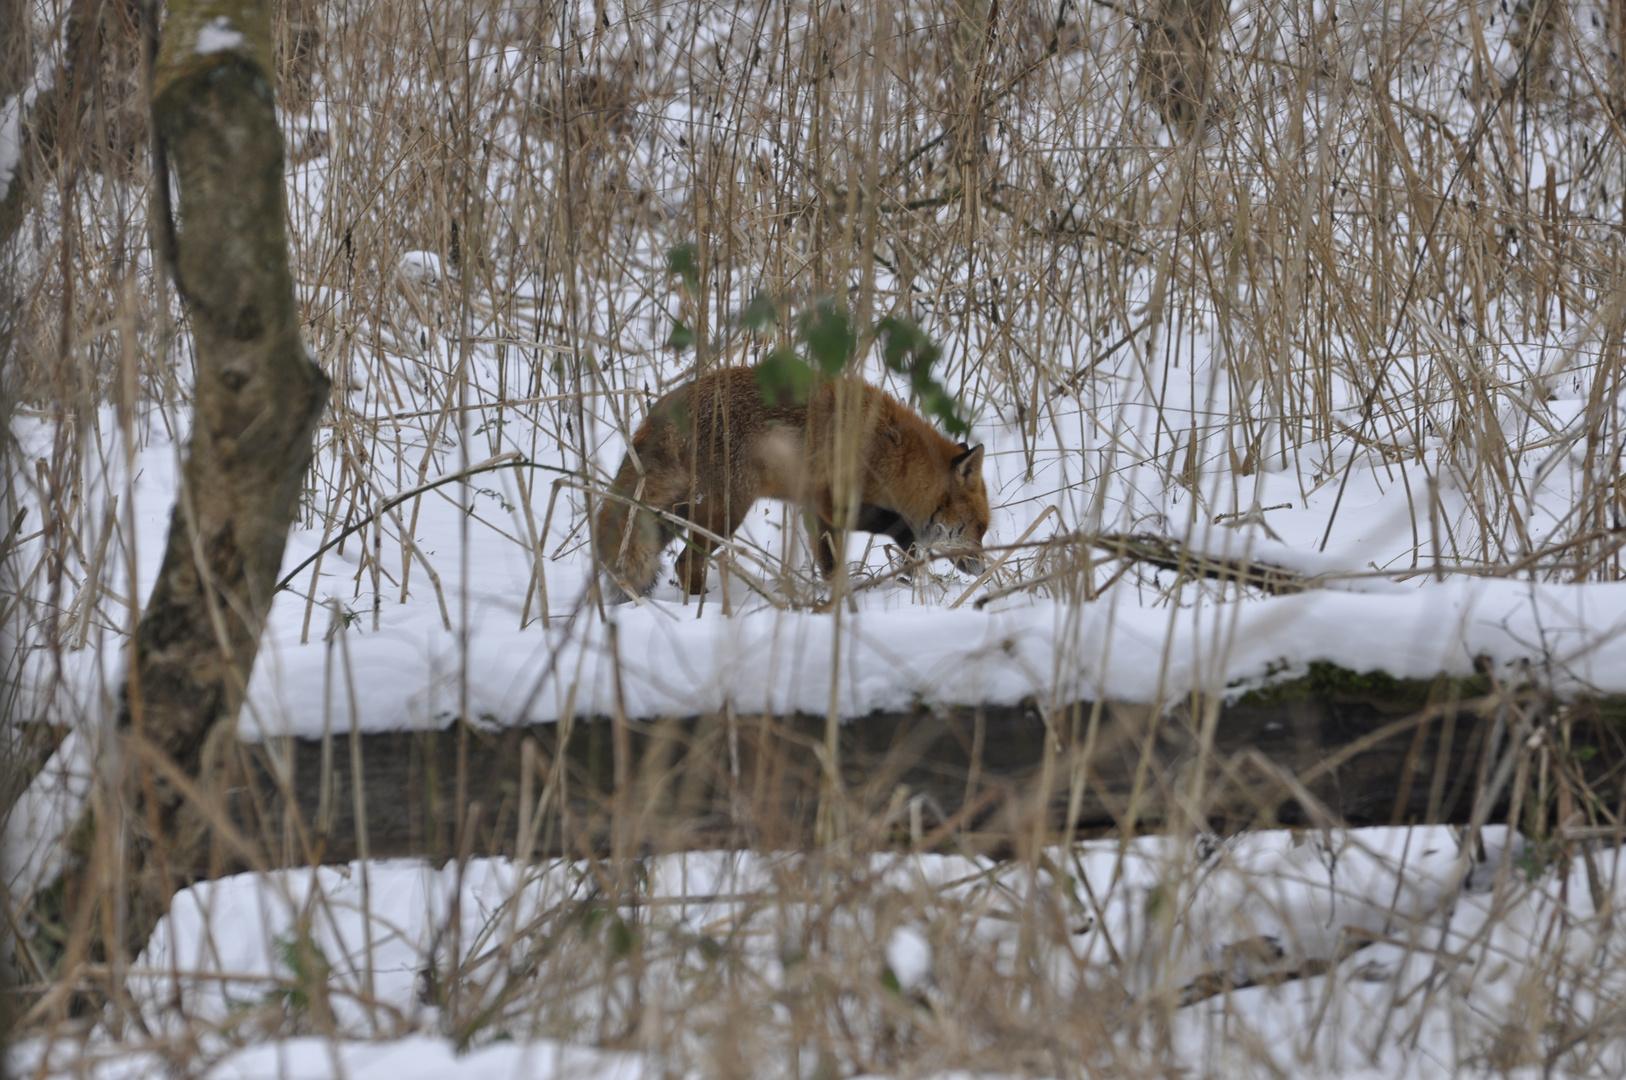 Fuchs und Pelzmantel